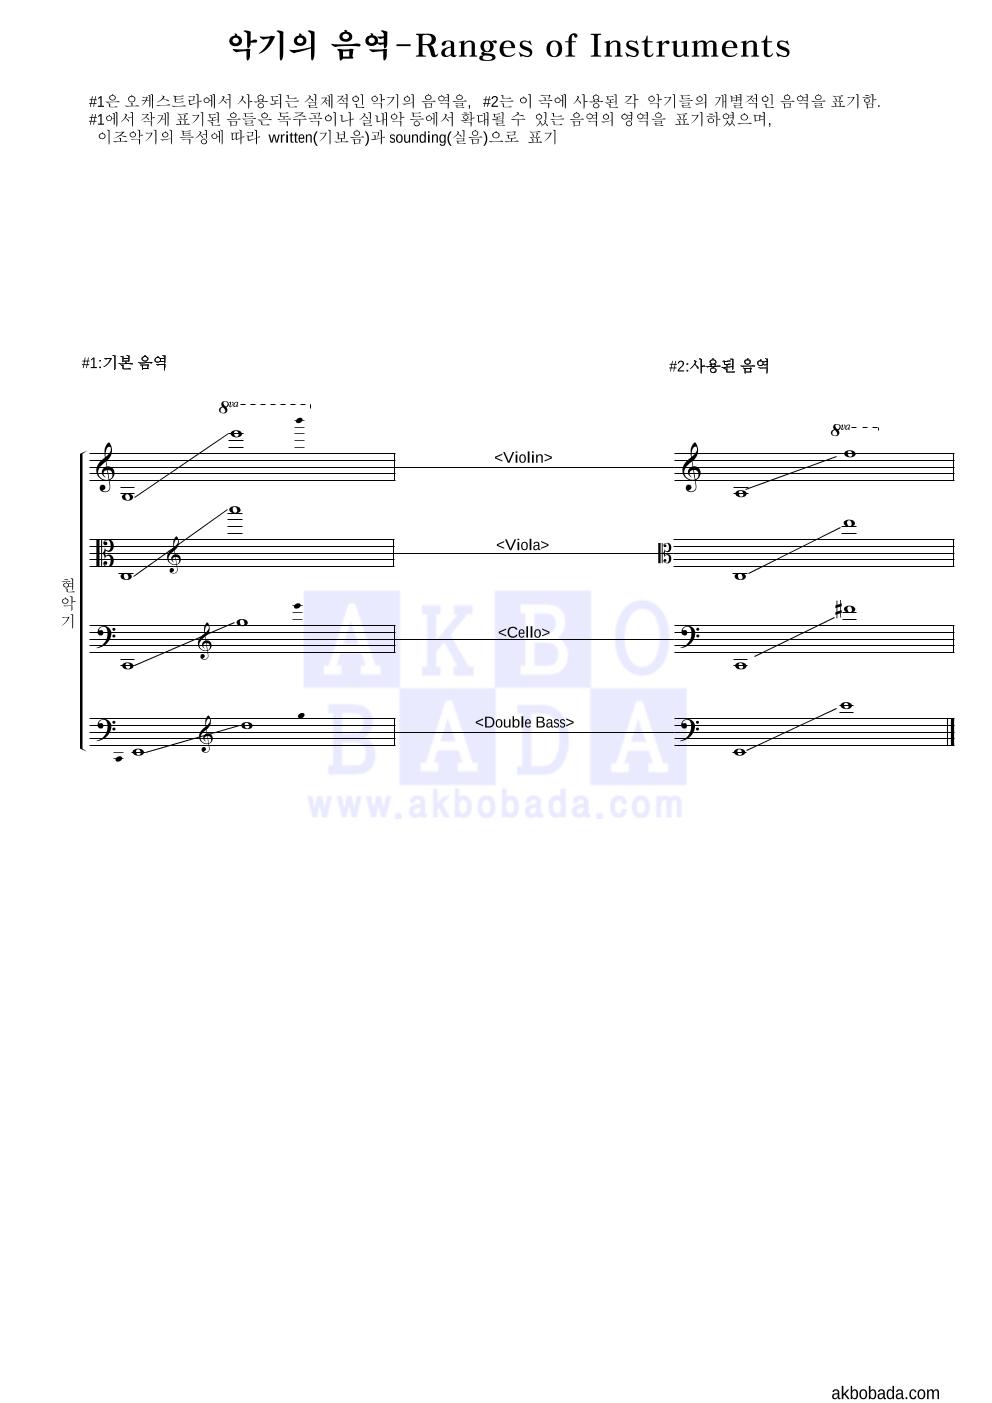 Hisaishi Joe - 인생의 회전목마 편성Ⅴ 악보